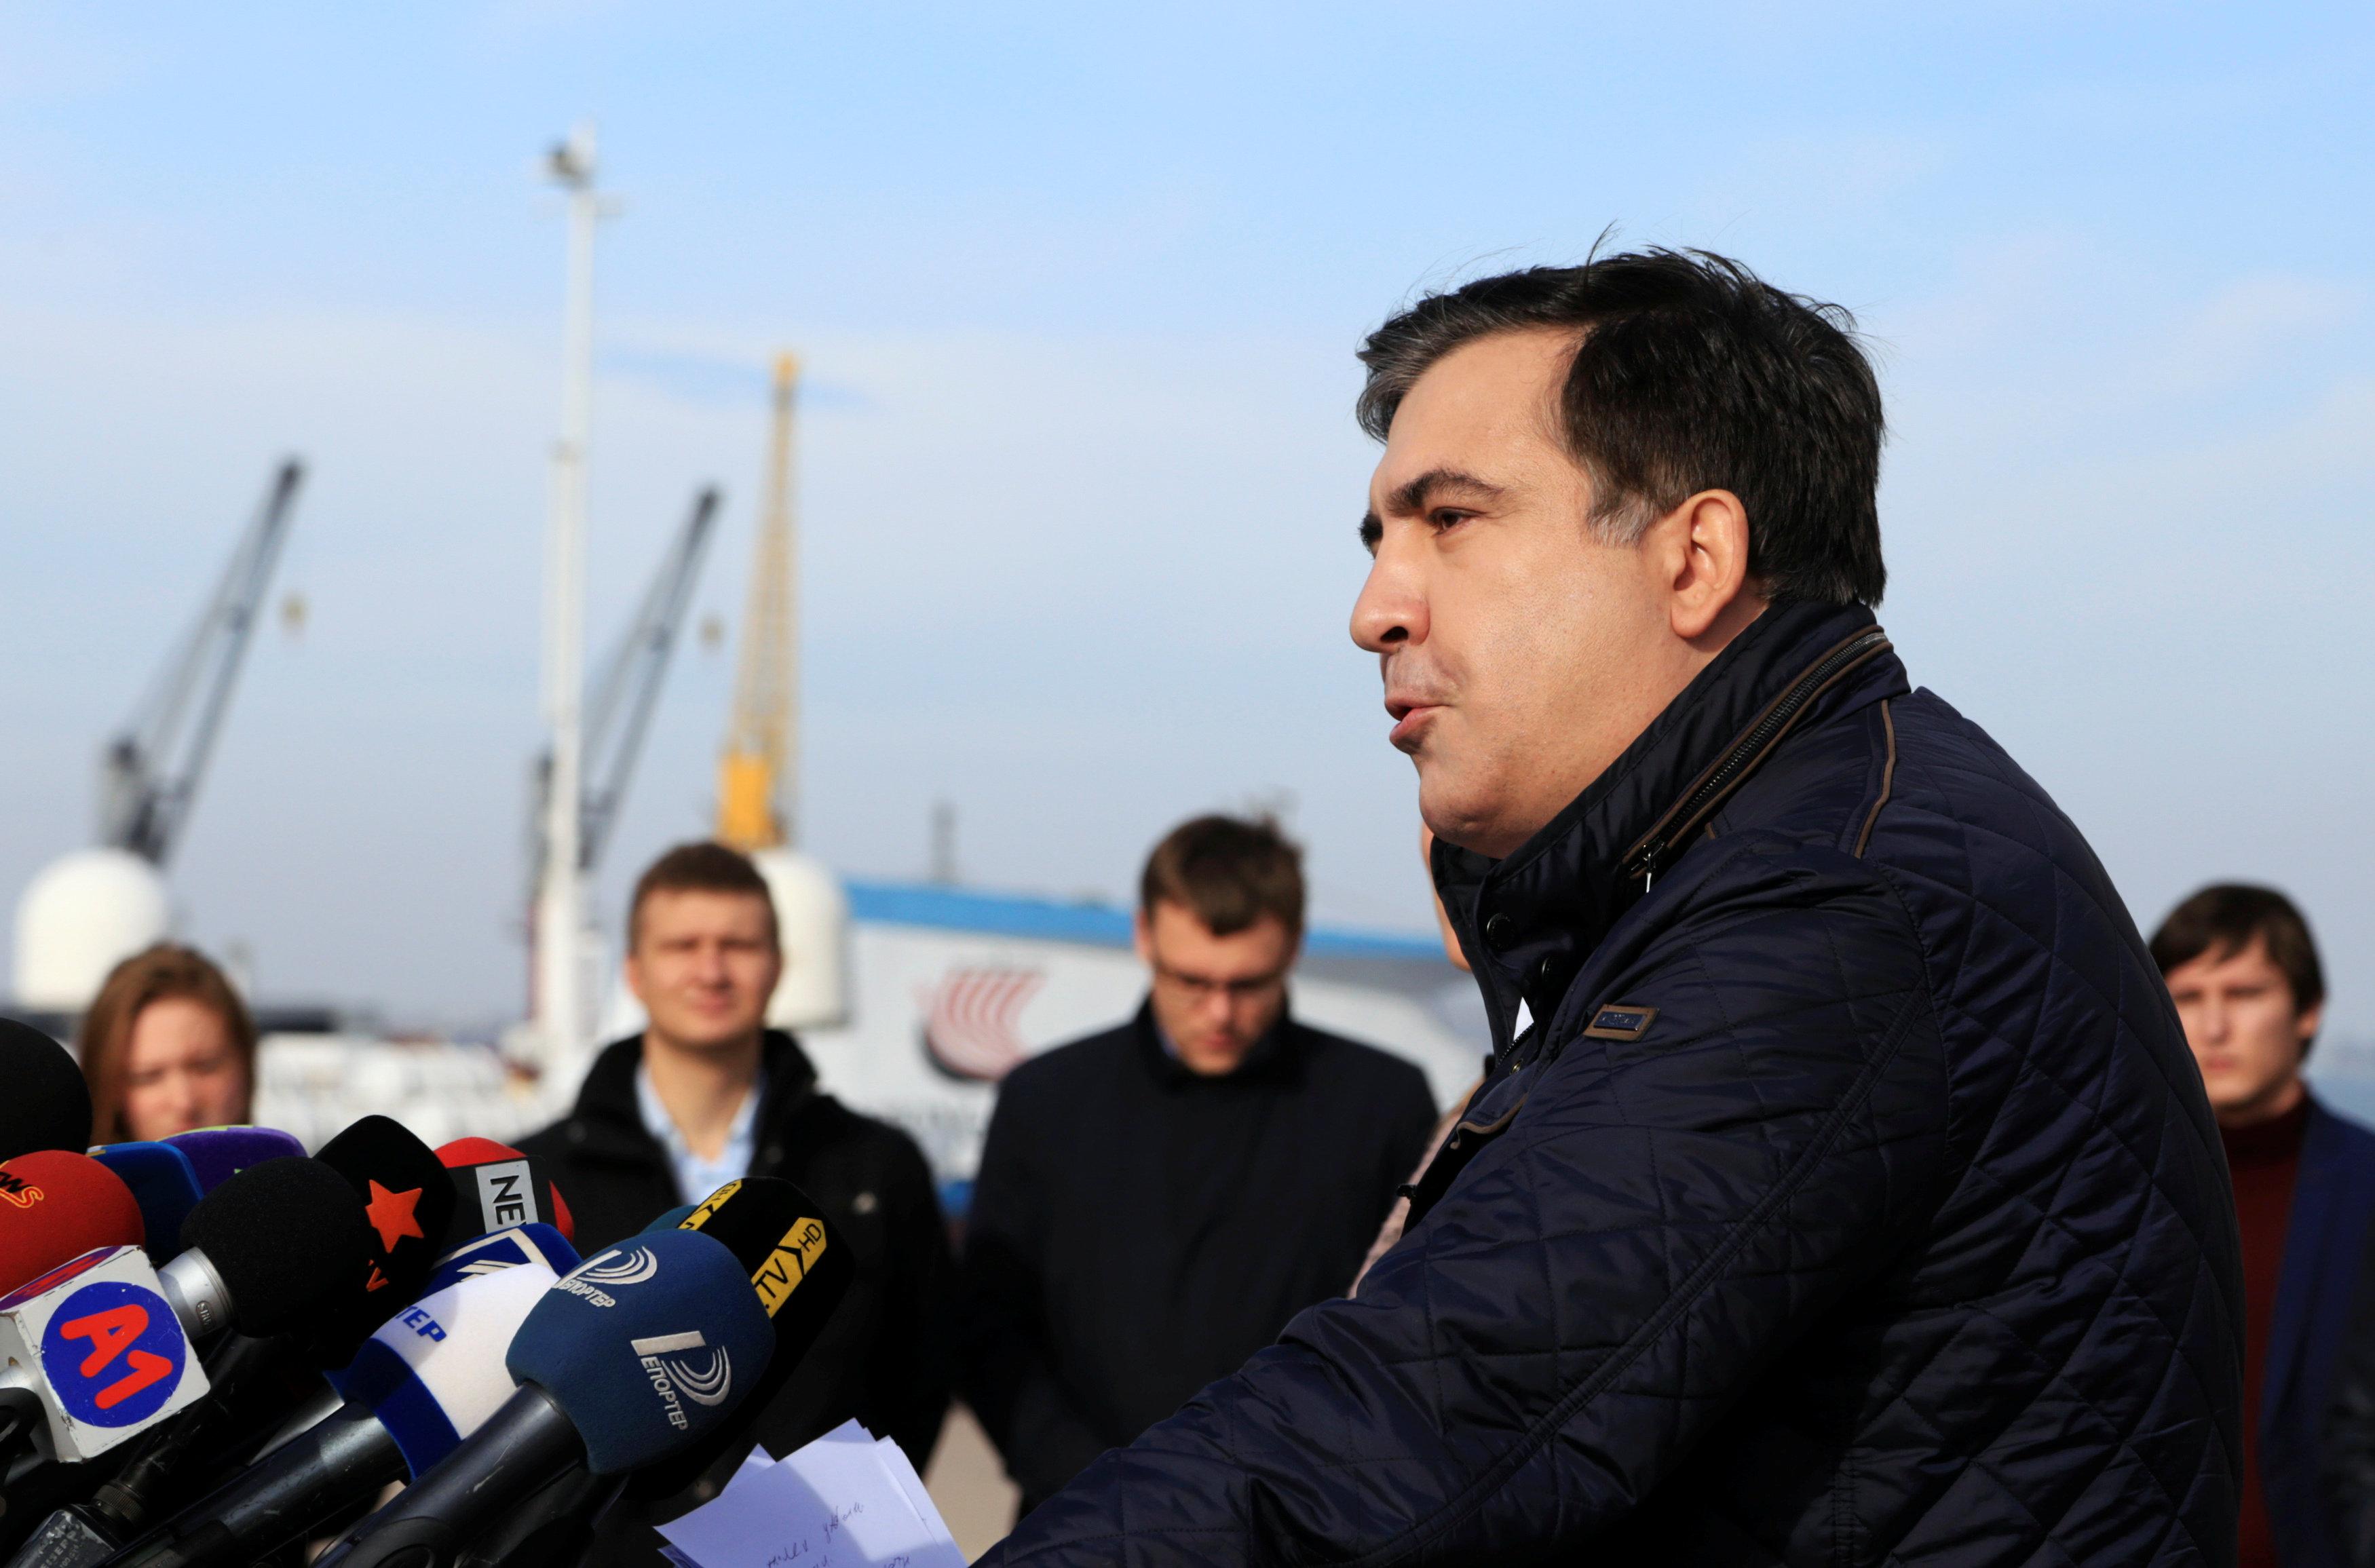 Quitting as regional governor, Saakashvili hits out at Ukraine's Poroshenko